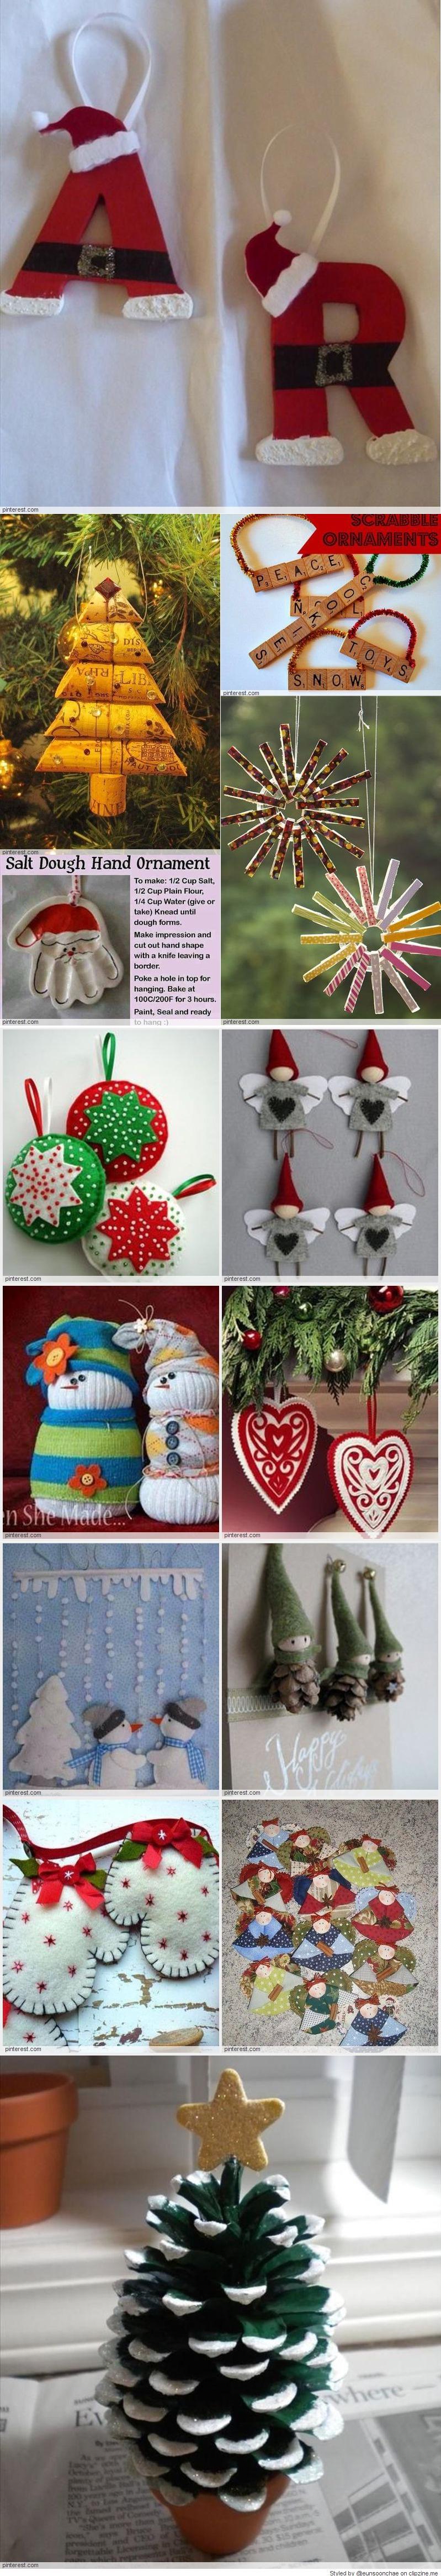 Christmas Crafts | X mas Origami | Pinterest | Crafts, DIY Christmas ...